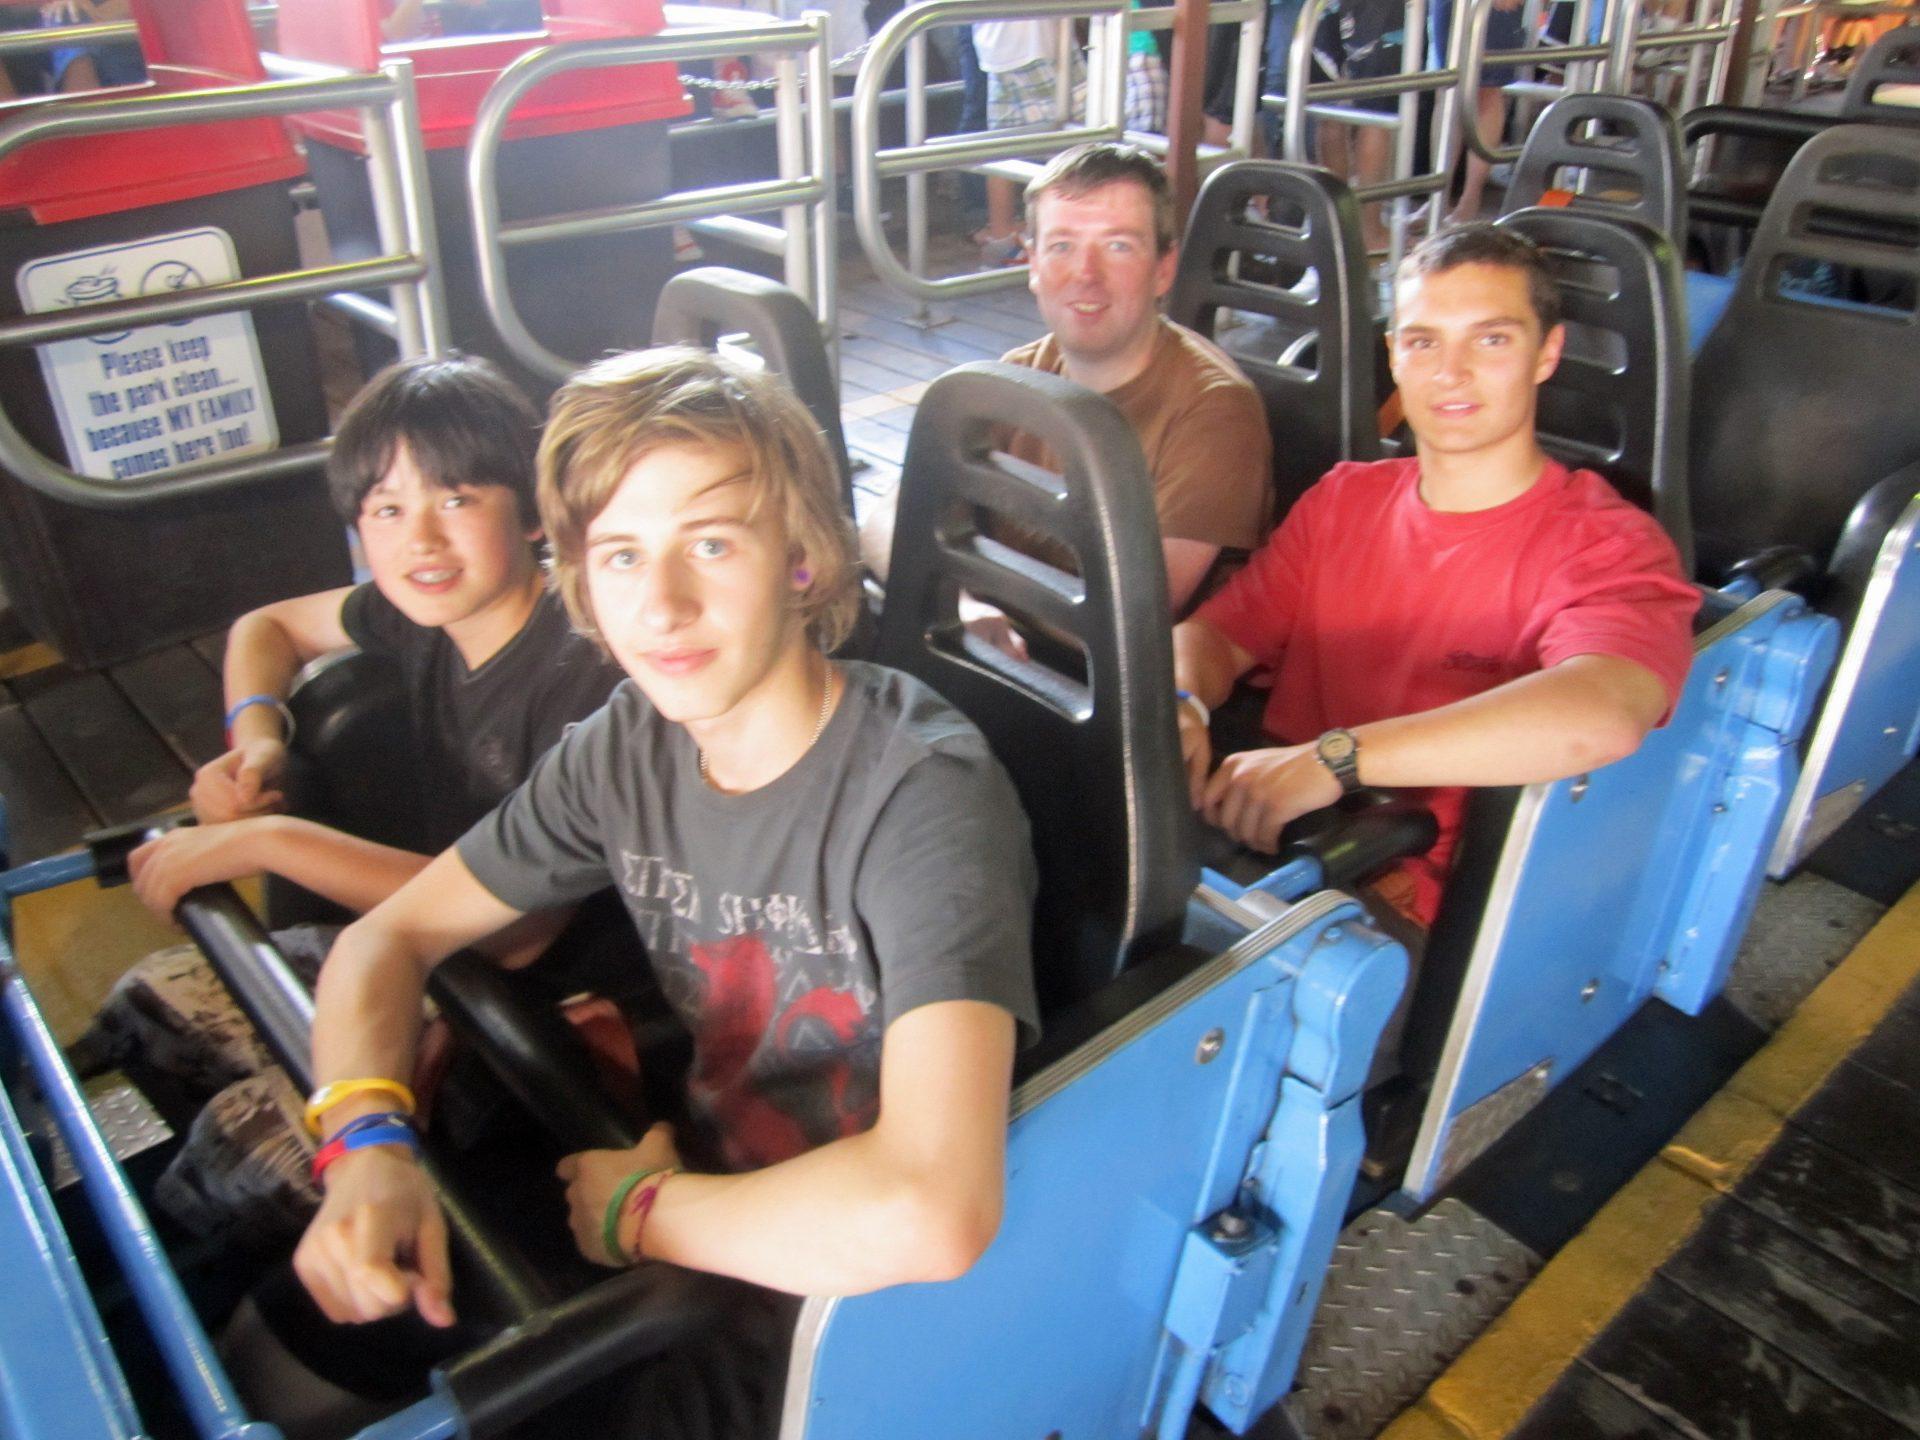 Lapbar bar coaster roller lap and harness shoulder